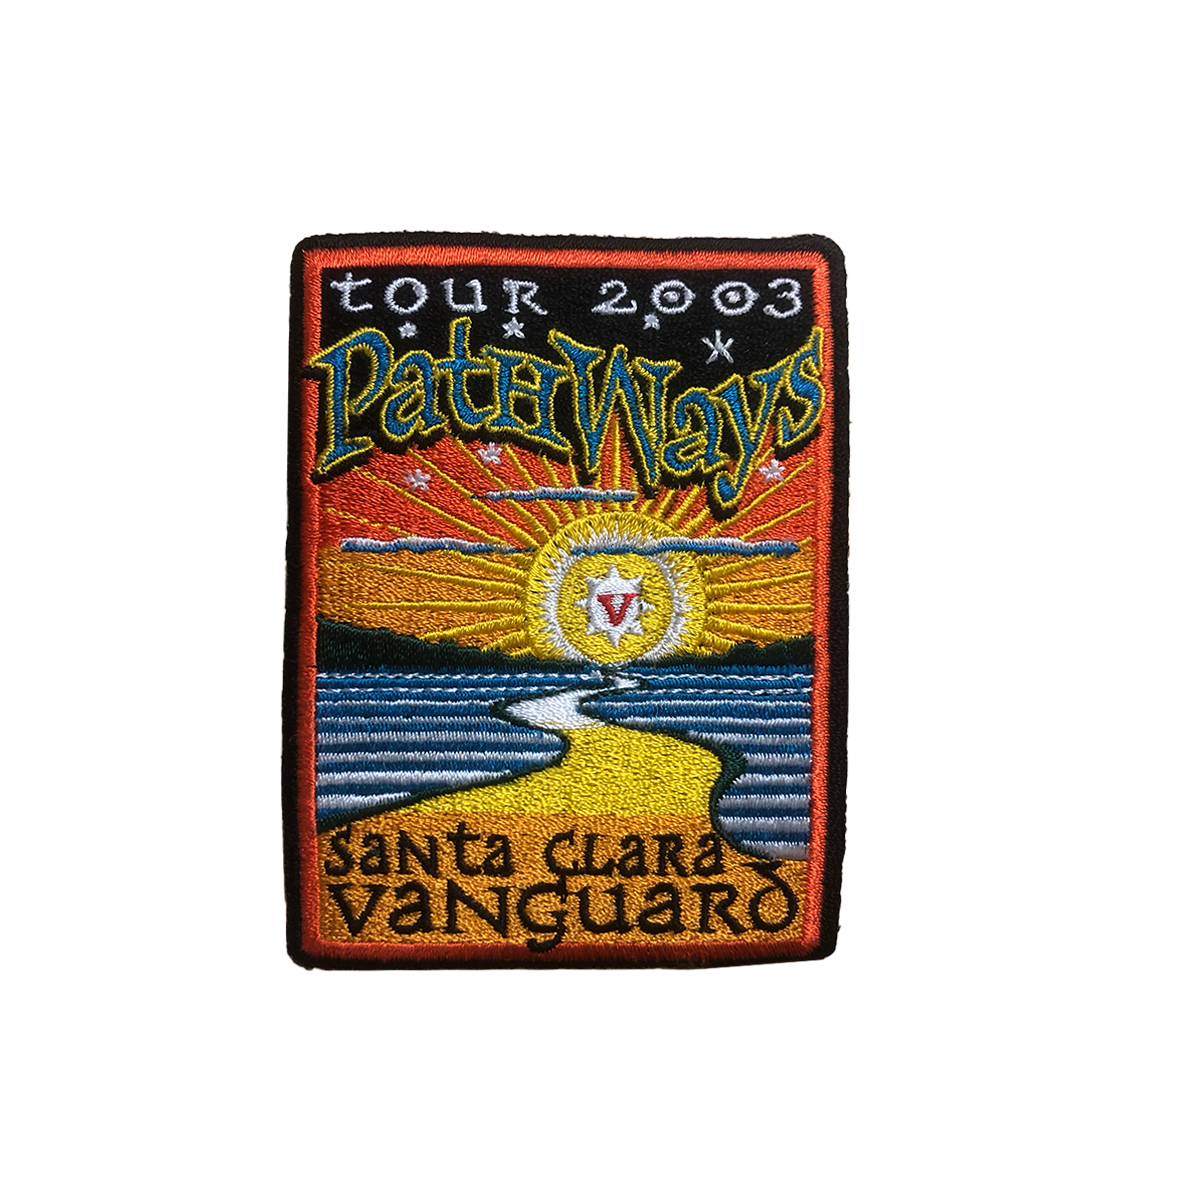 2003 Pathways Tour Patch